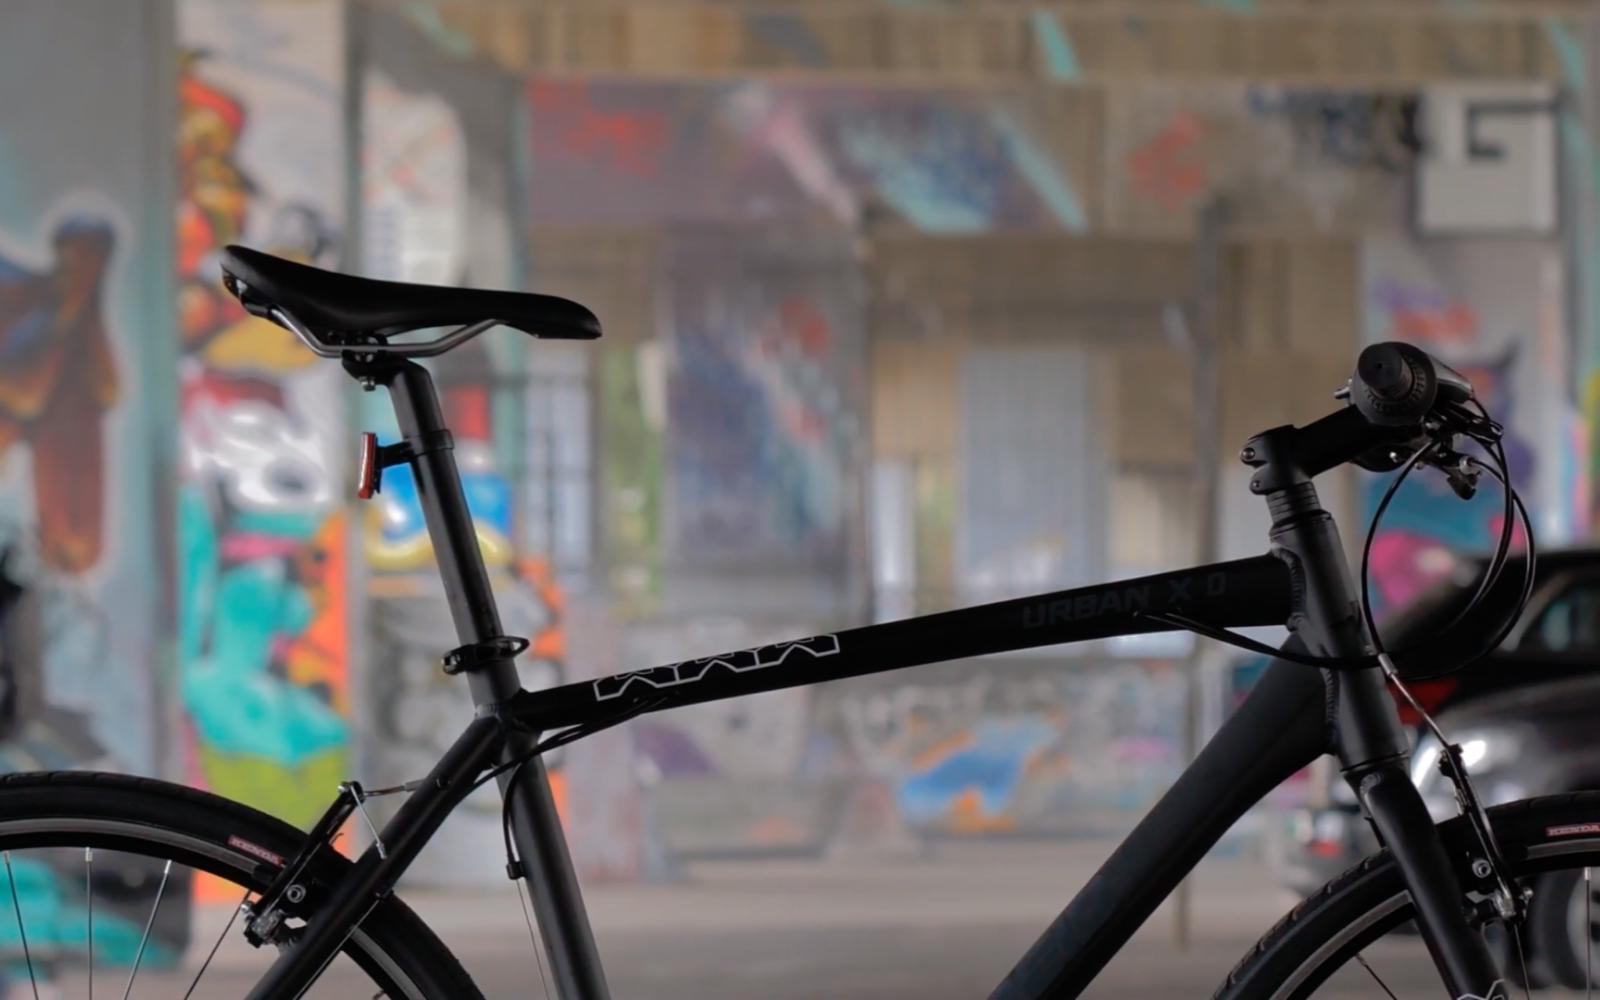 81 1 - Reid ® - Urban X0 Bike